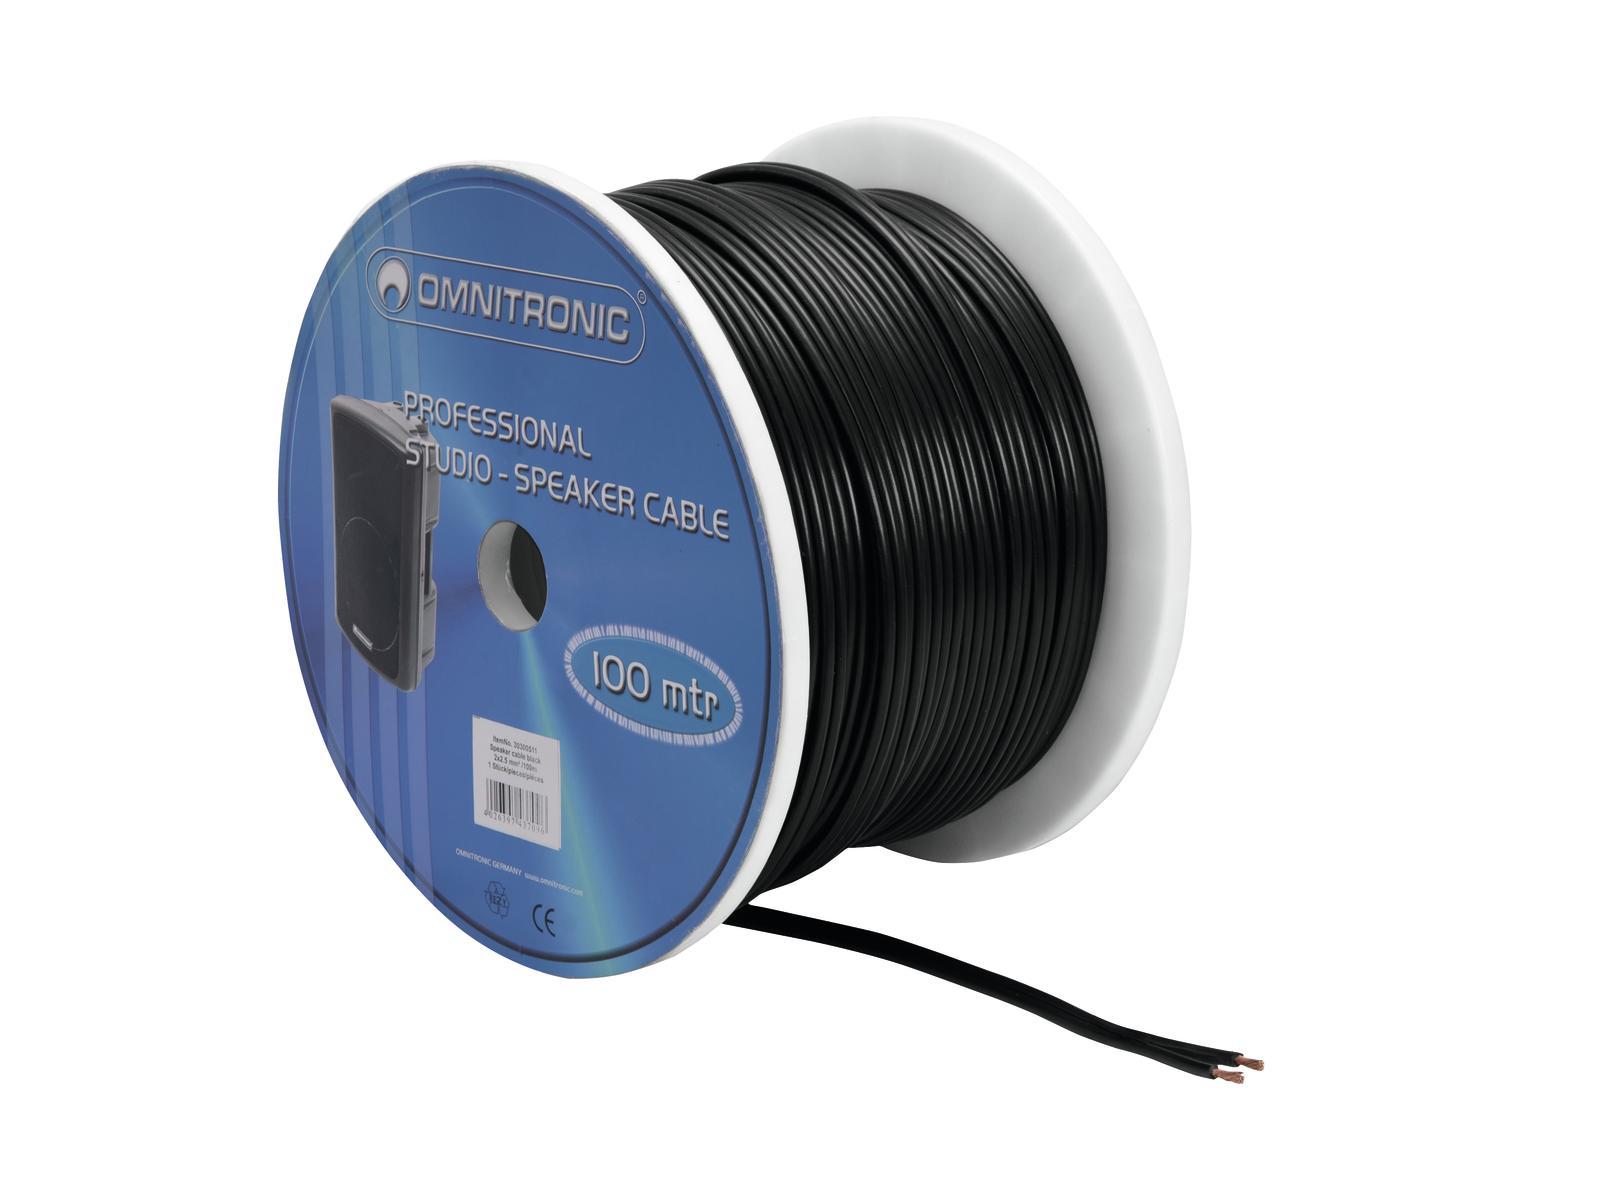 Cable Coil Coil Cable Bulk 2x2.5 100m Omnitronic